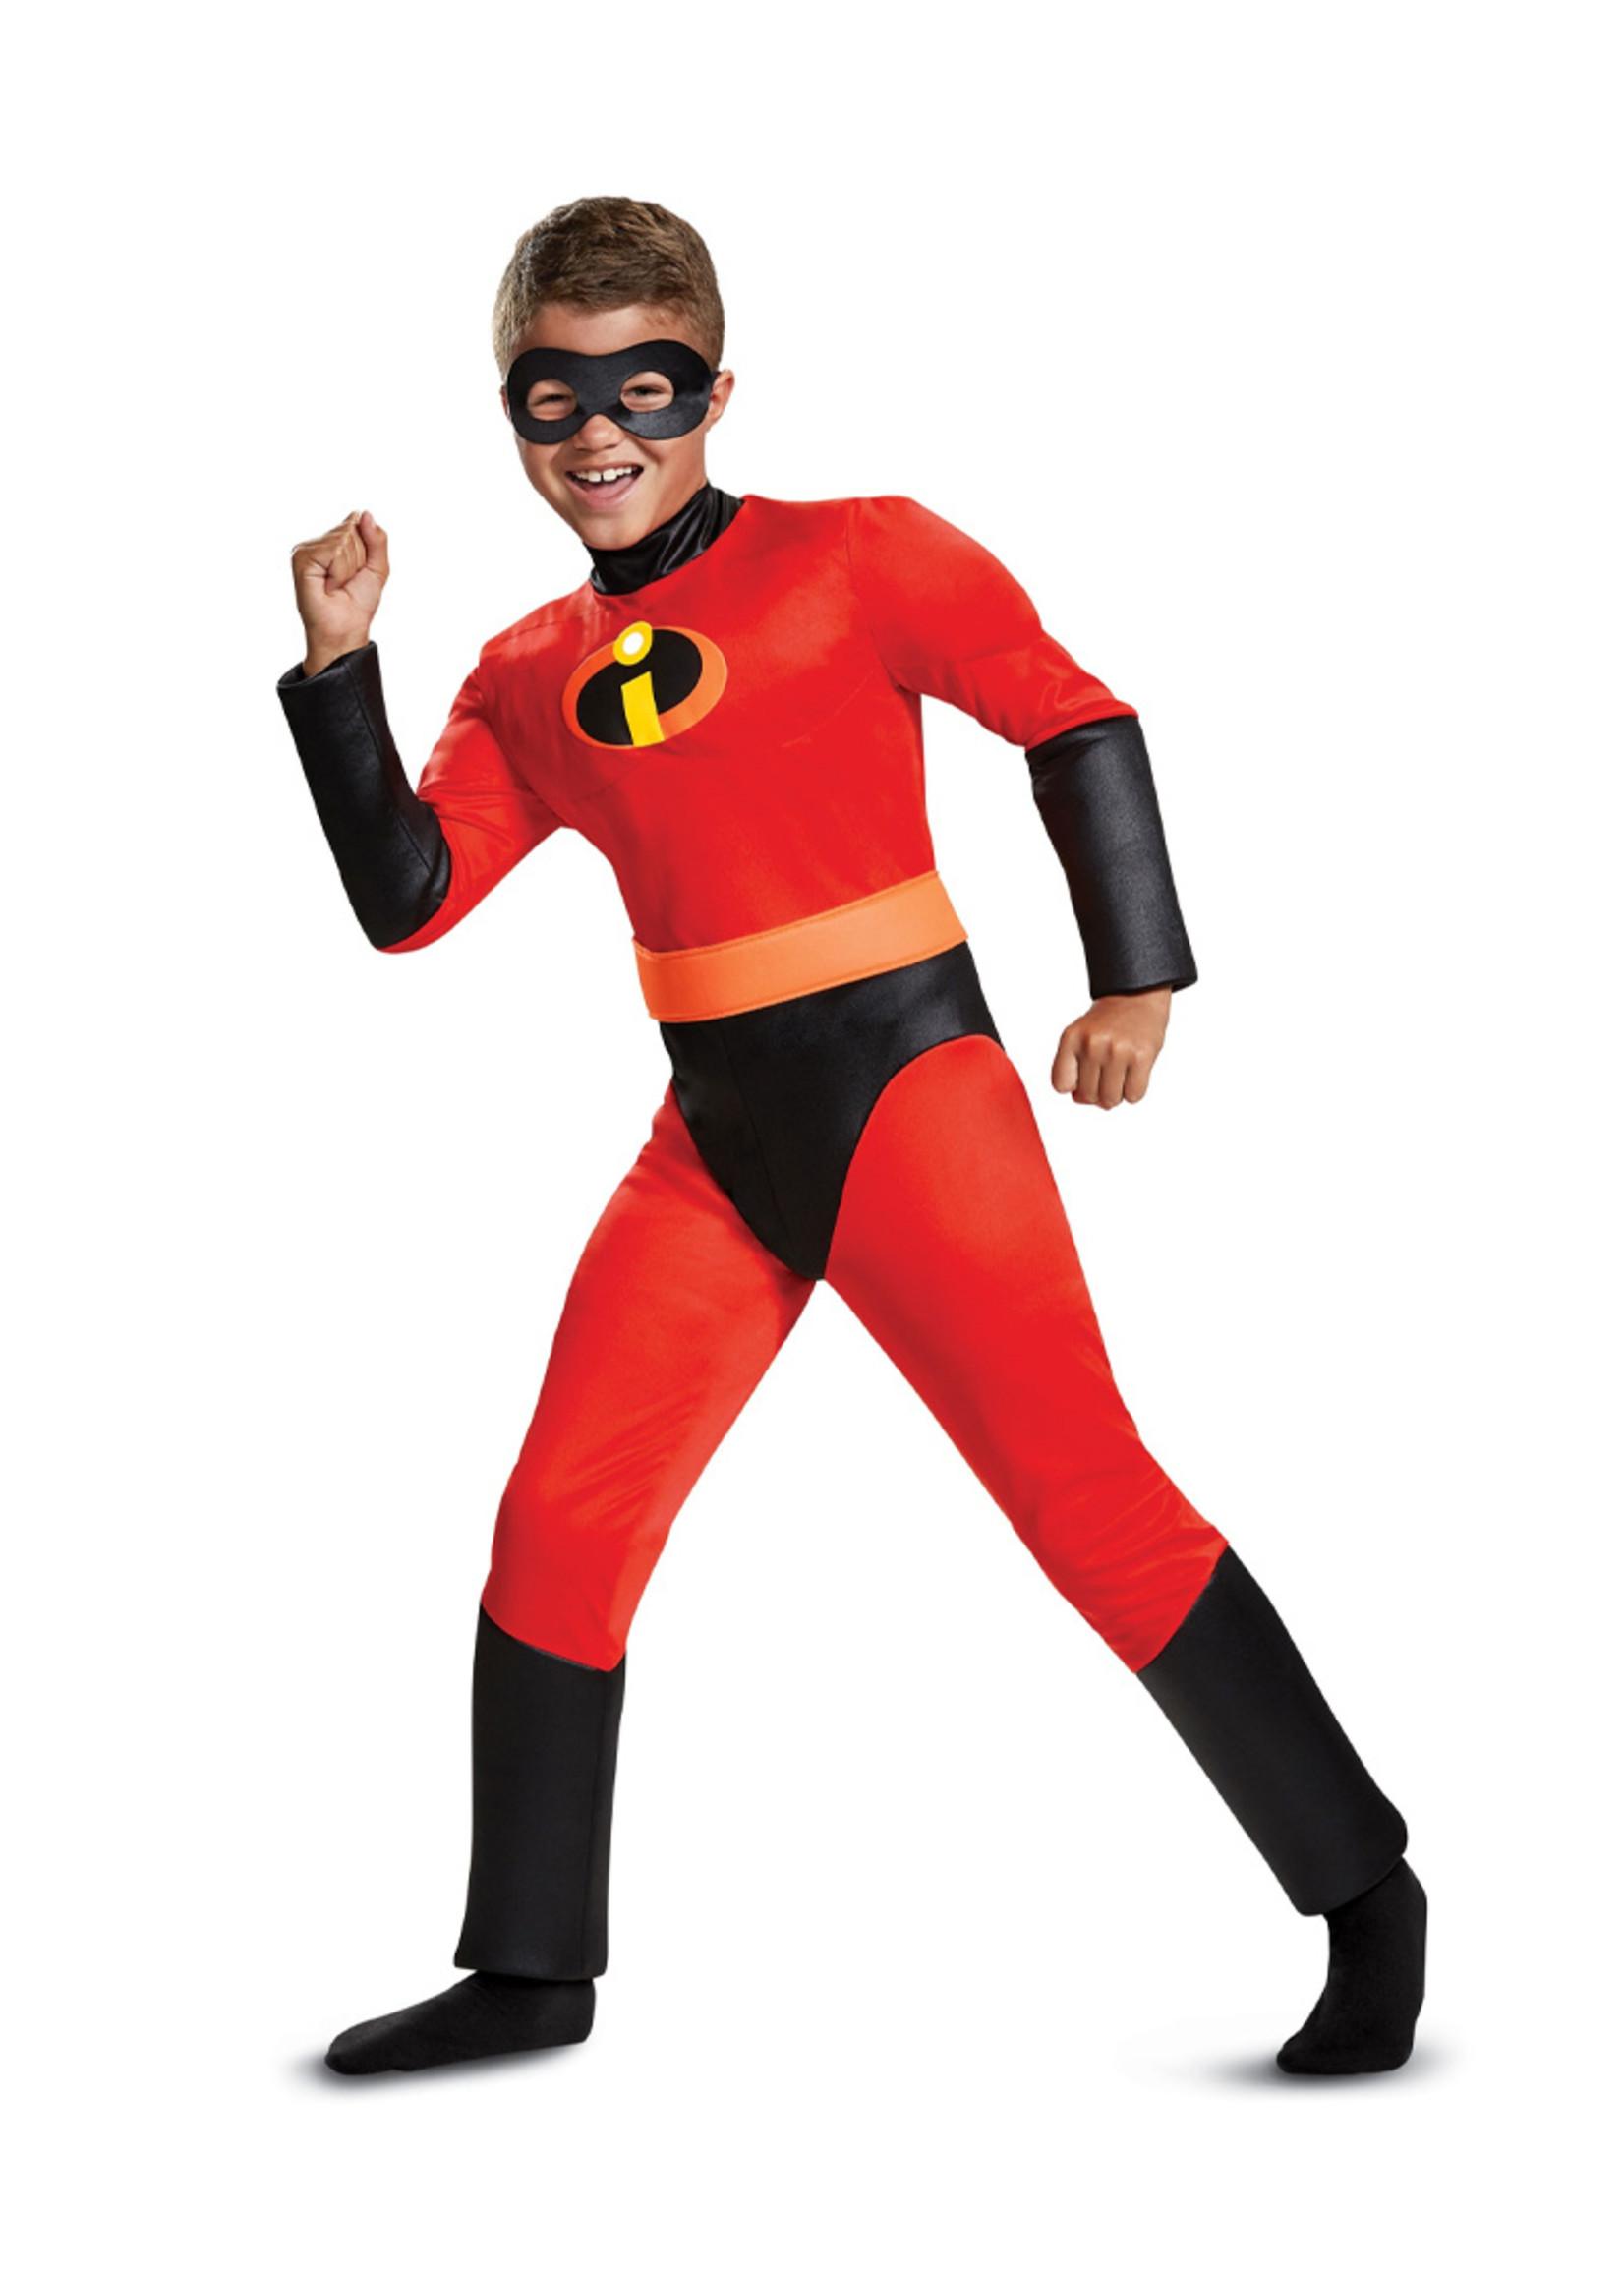 DISGUISE Dash Incredible Costume - Boys